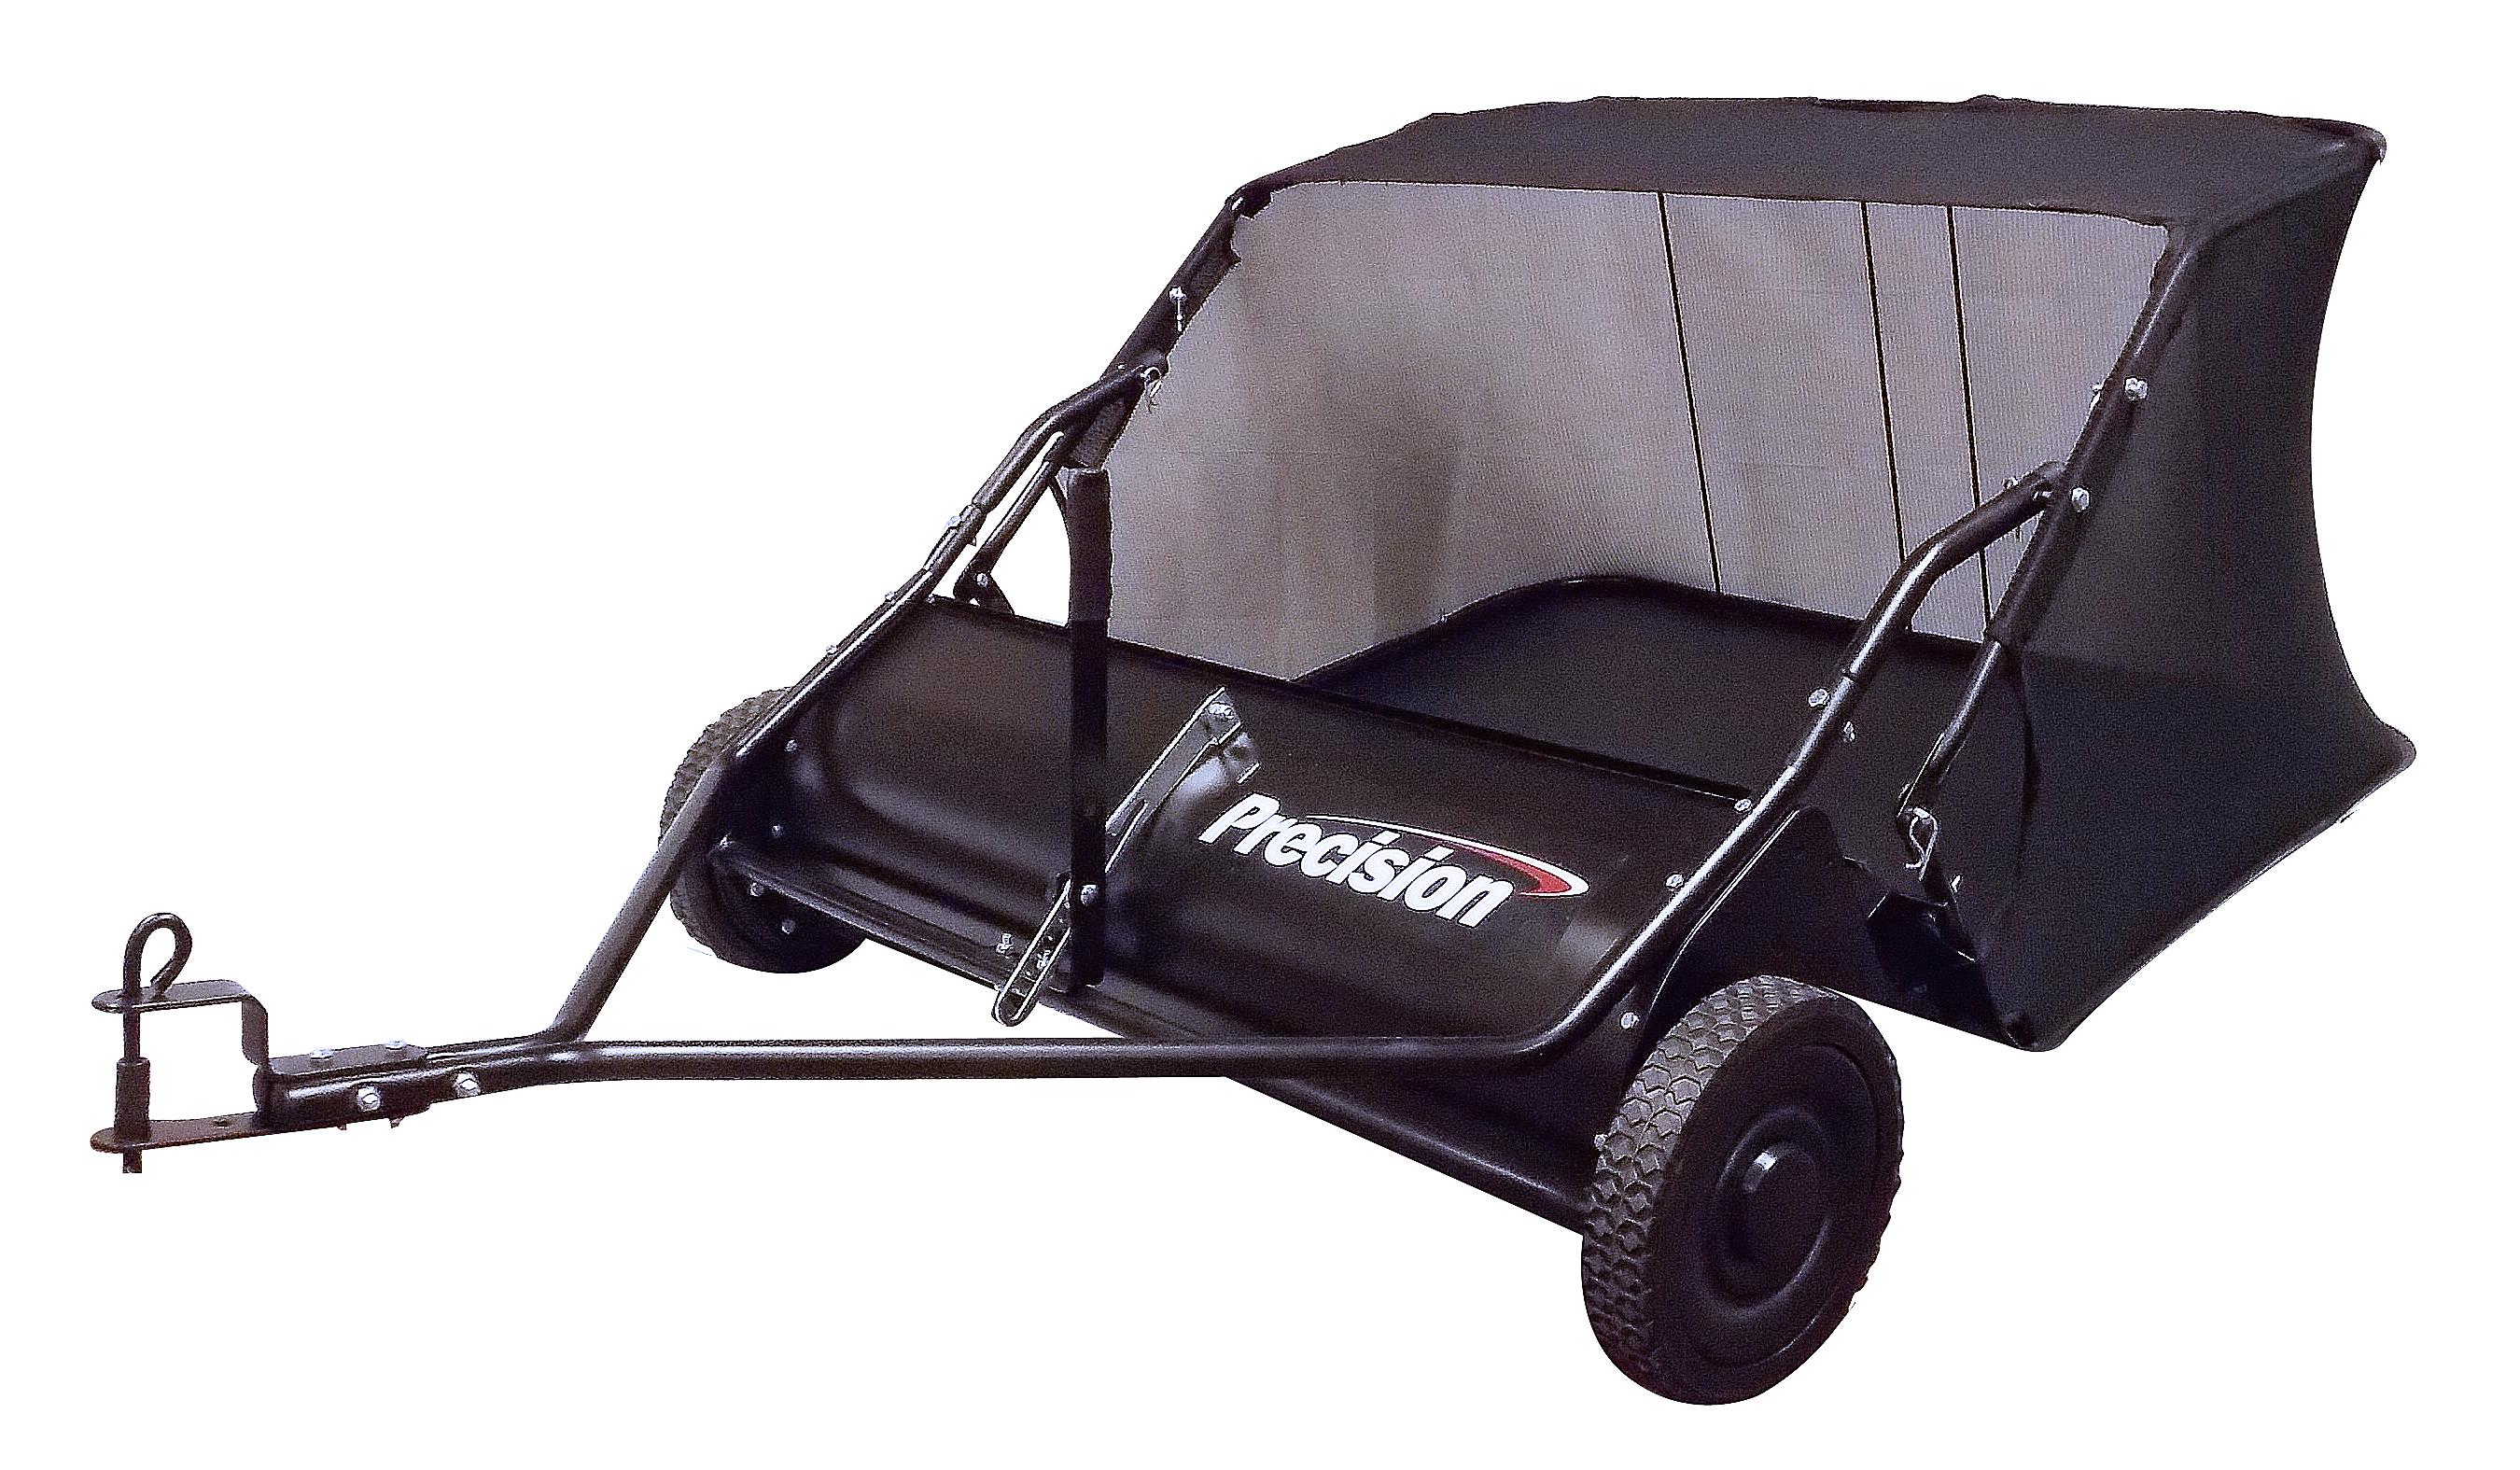 Sears Craftsman Lawn Sweeper